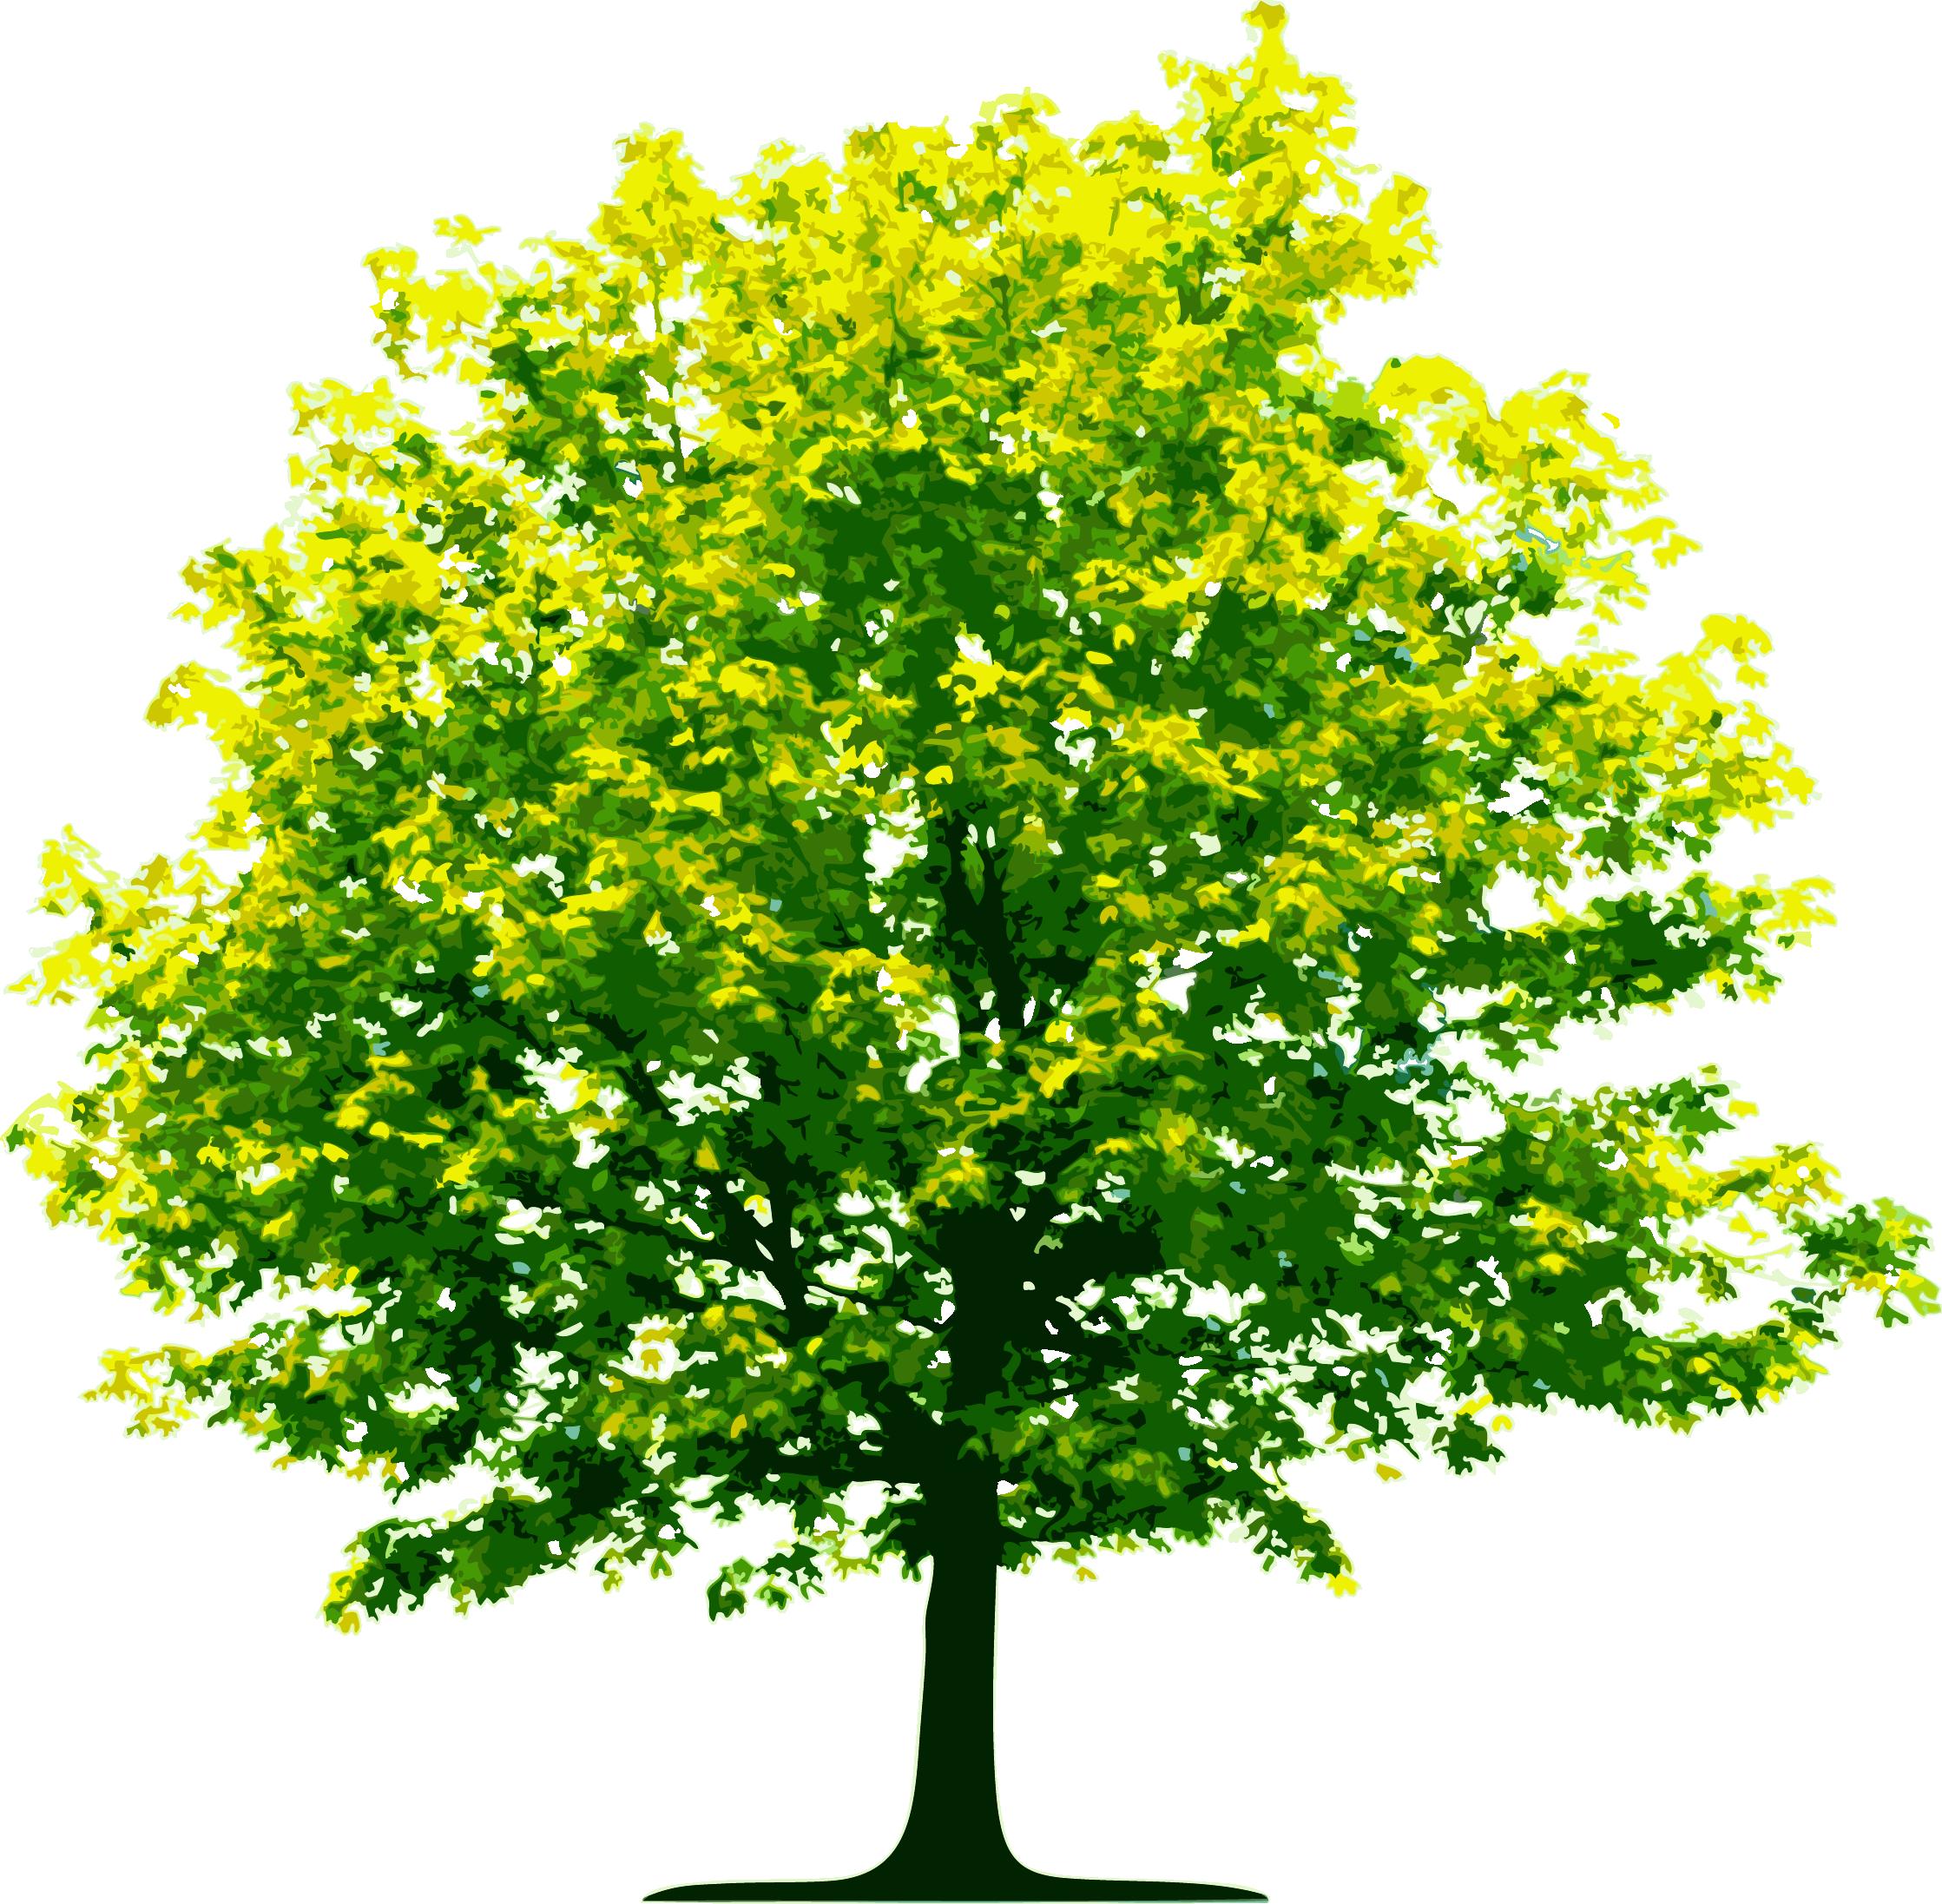 png transparent stock Aamu tree planting wednesday. Vector bushes hutan